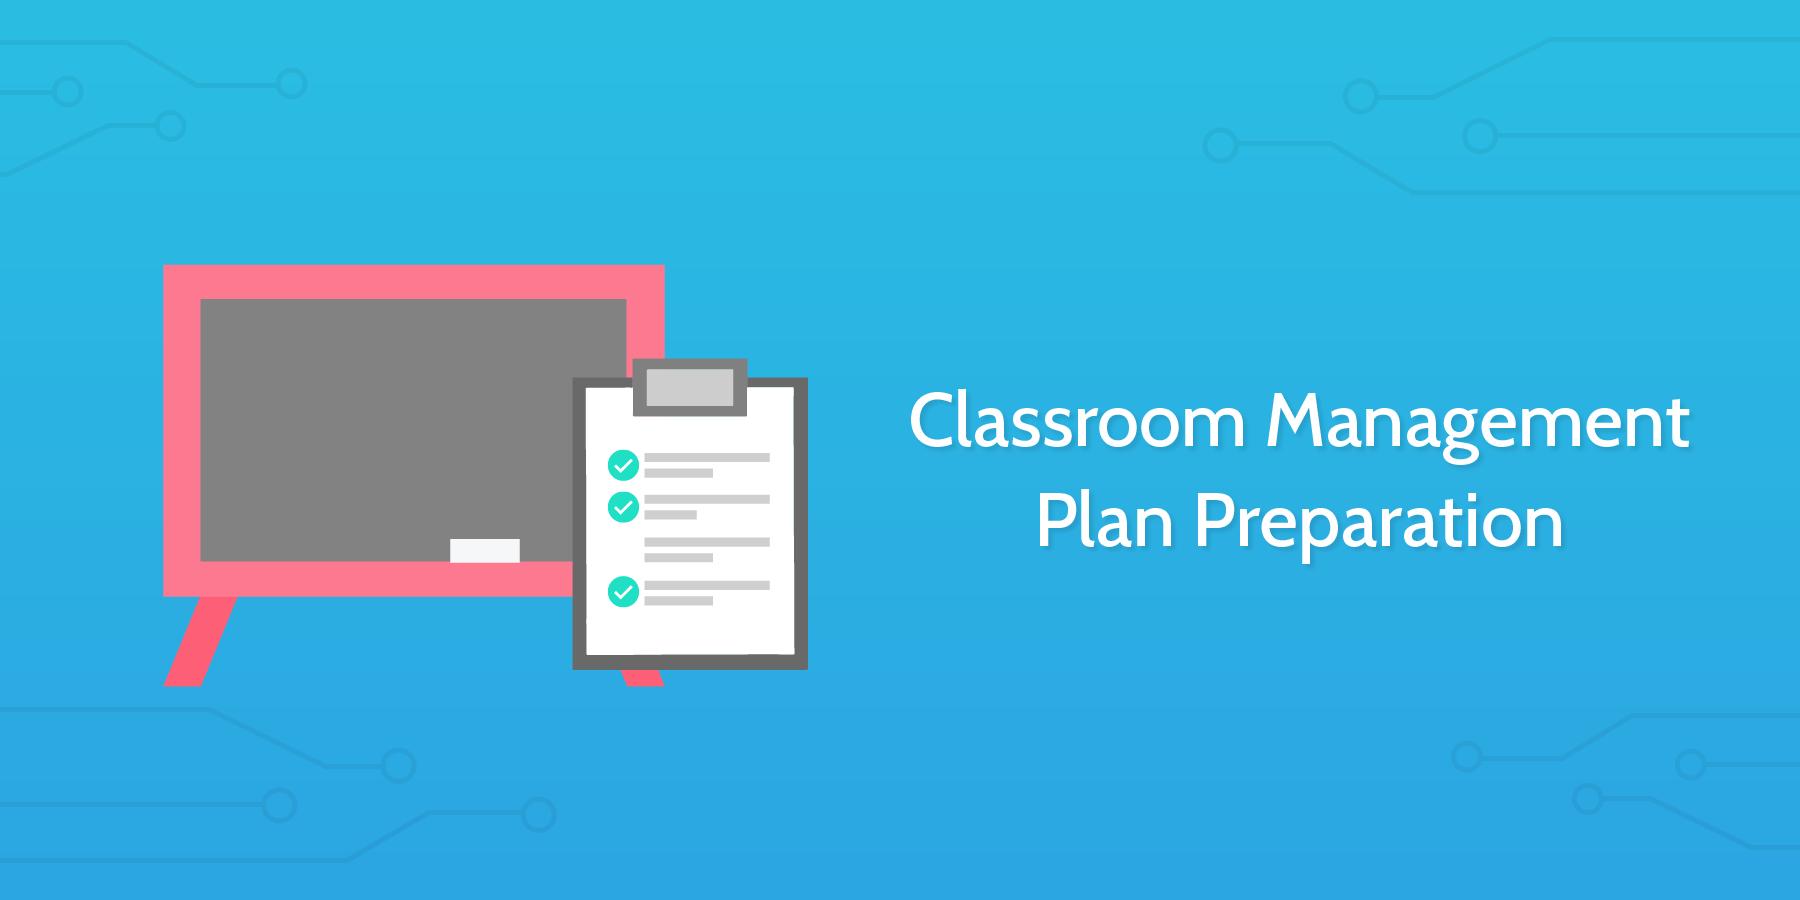 Classroom Management Plan Preparation - Process Street